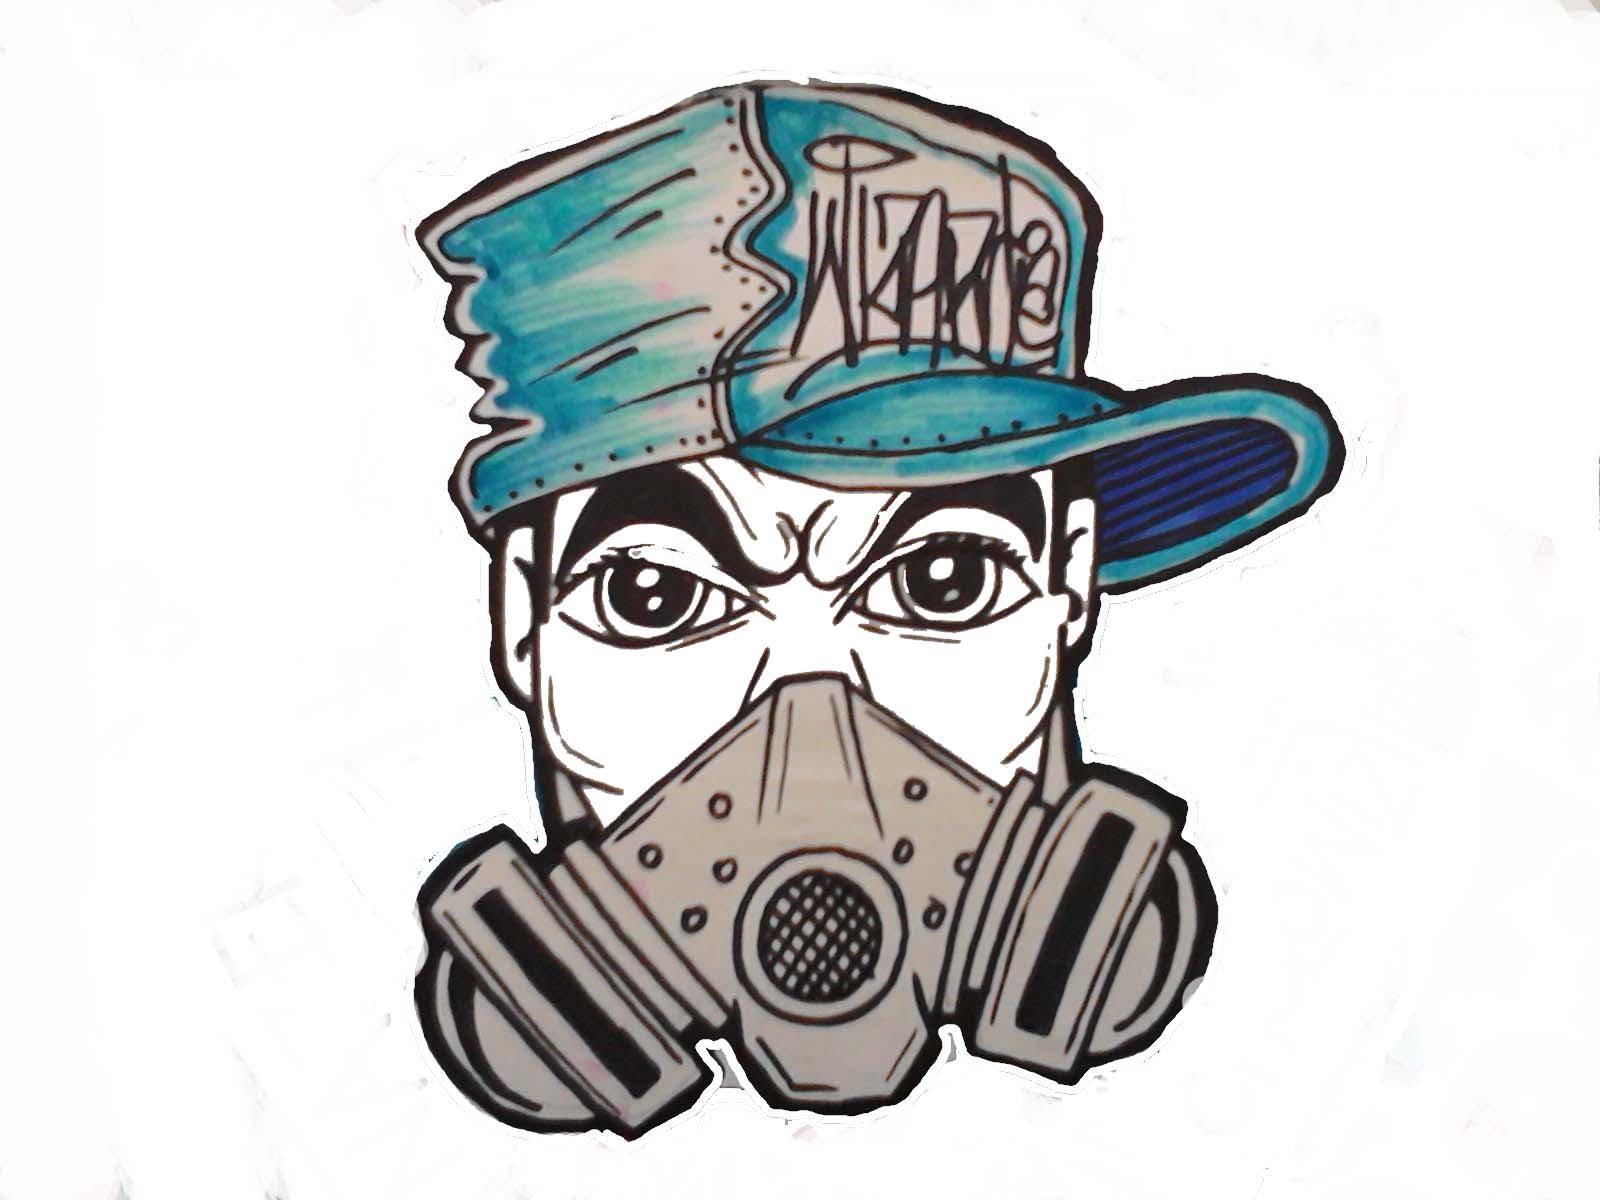 1600x1200 Graffiti Characters Gangster Skull Drawing A Gas Mask Character